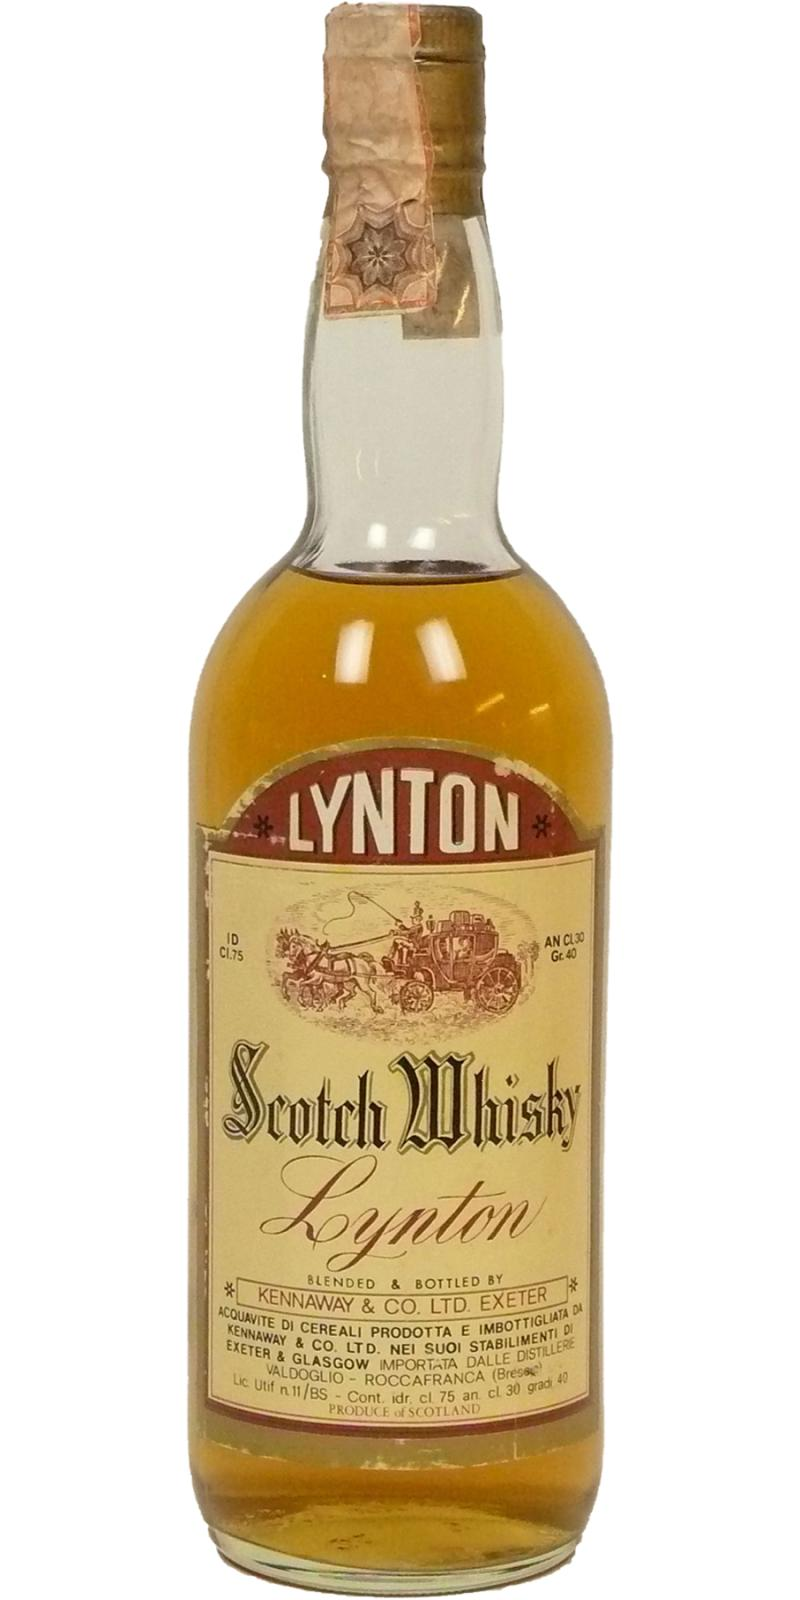 Lynton Scotch Whisky